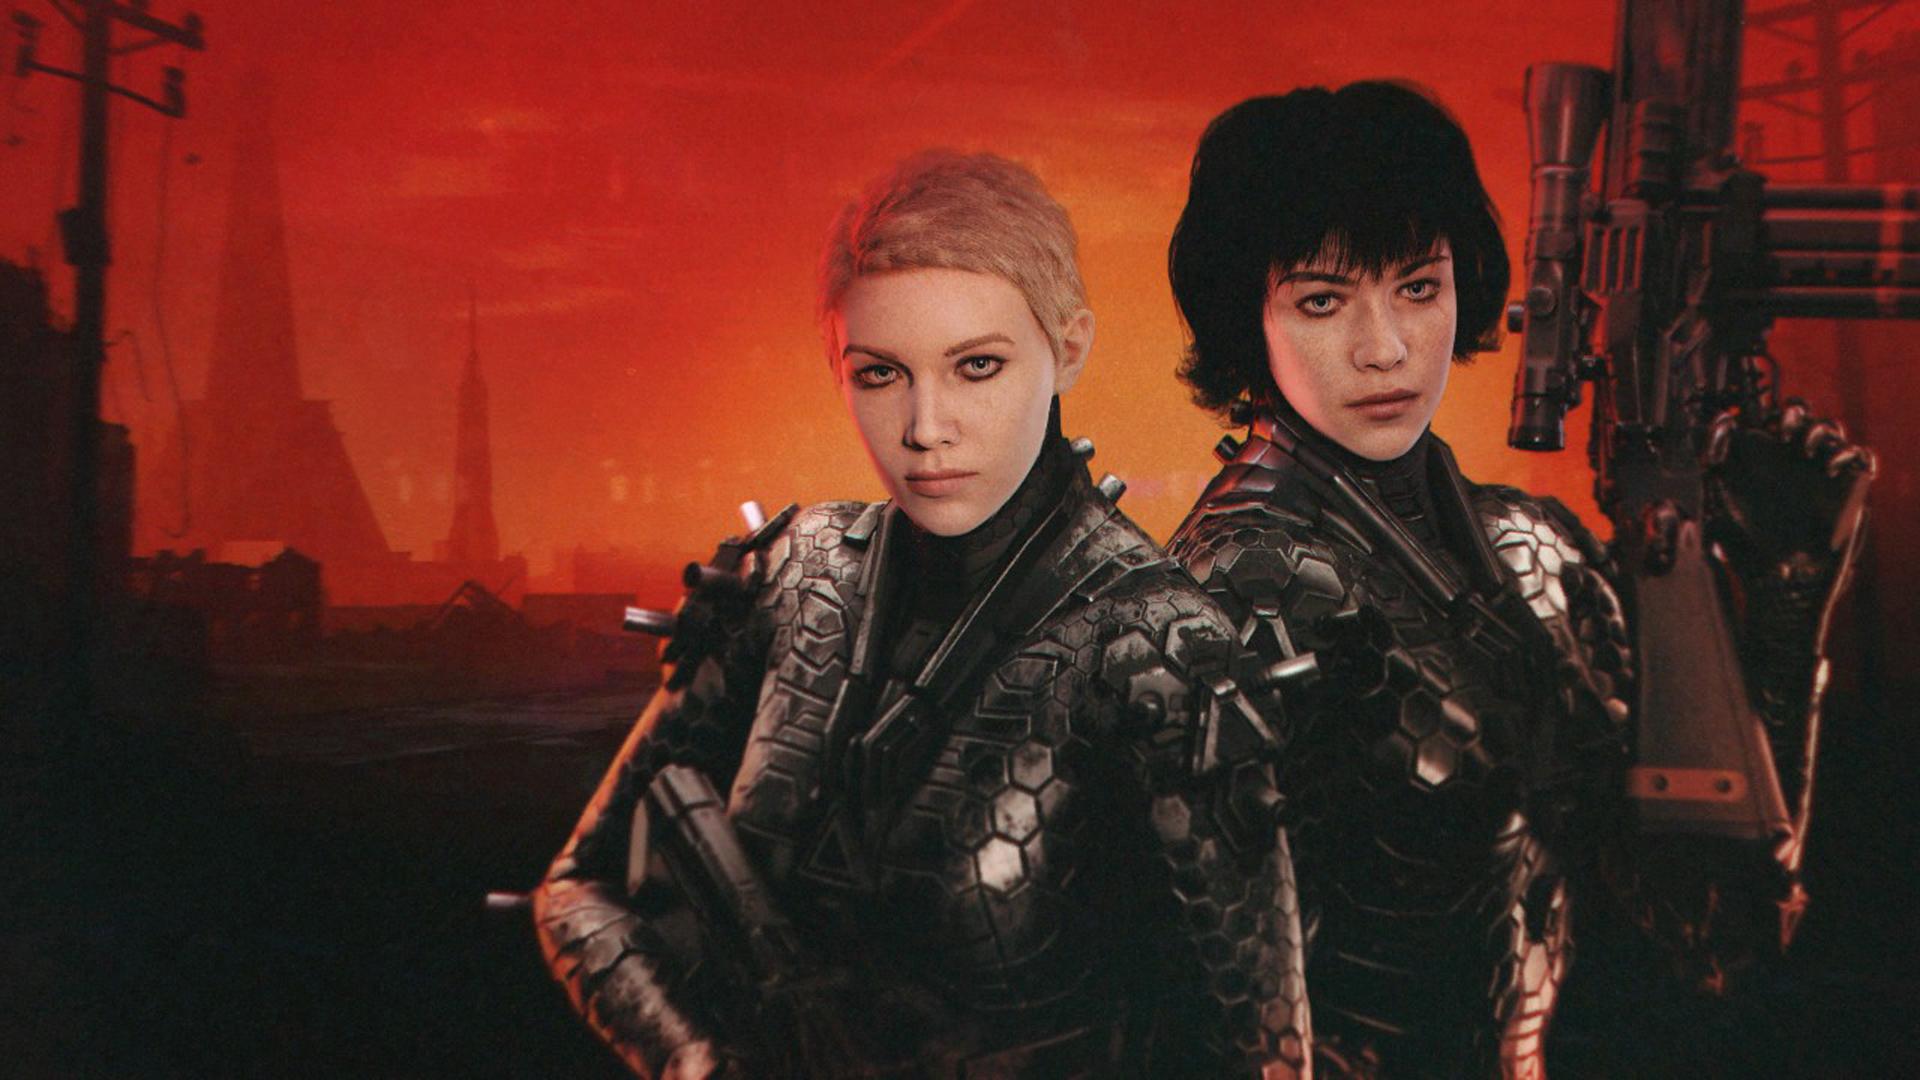 Blazkowicz sisters